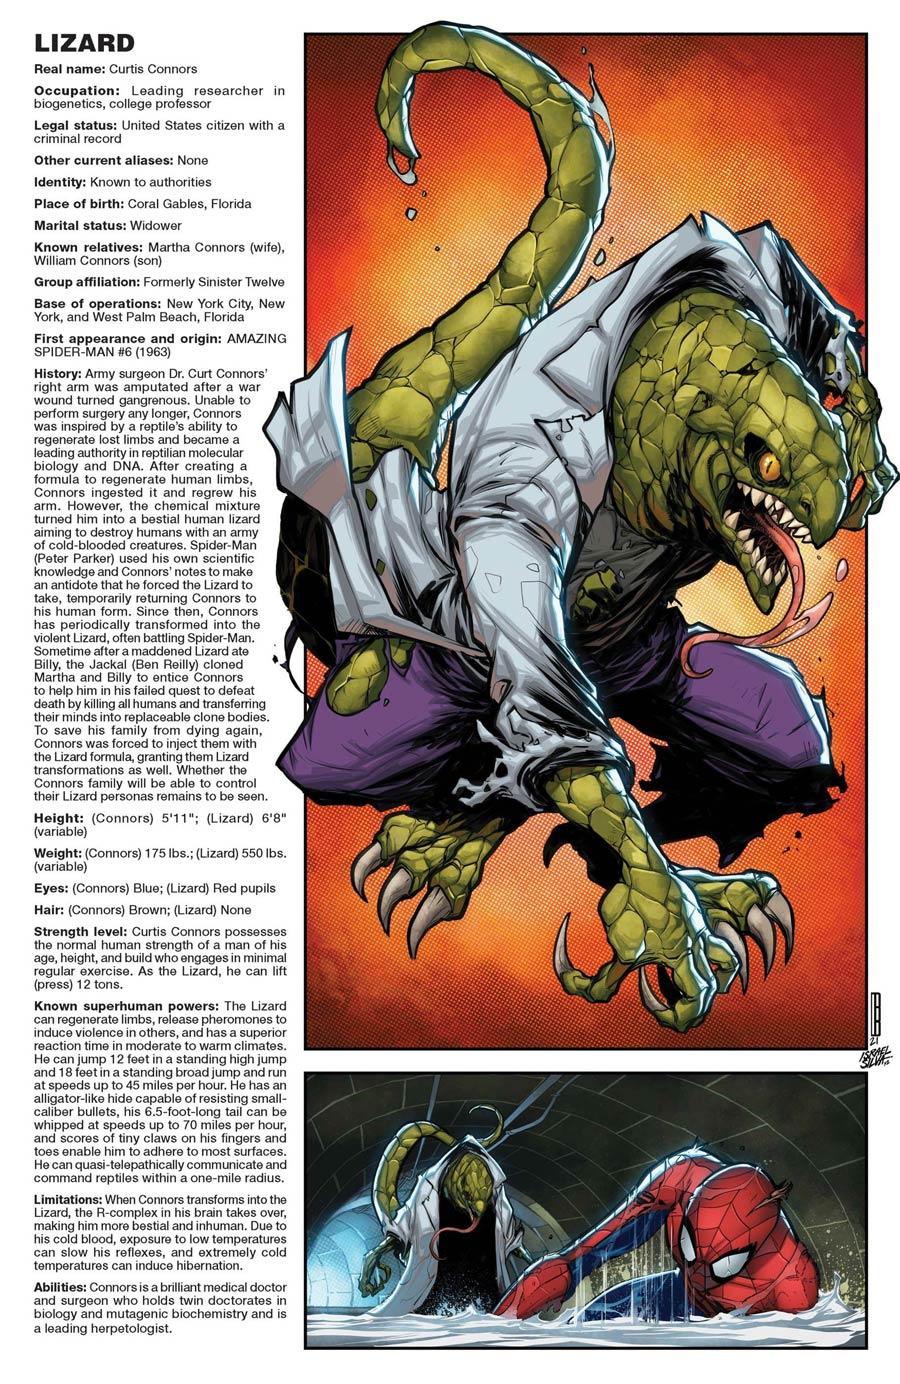 Amazing Spider-Man Vol 5 #71 Cover C Variant David Baldeon Handbook Cover (Sinister War Tie-In)